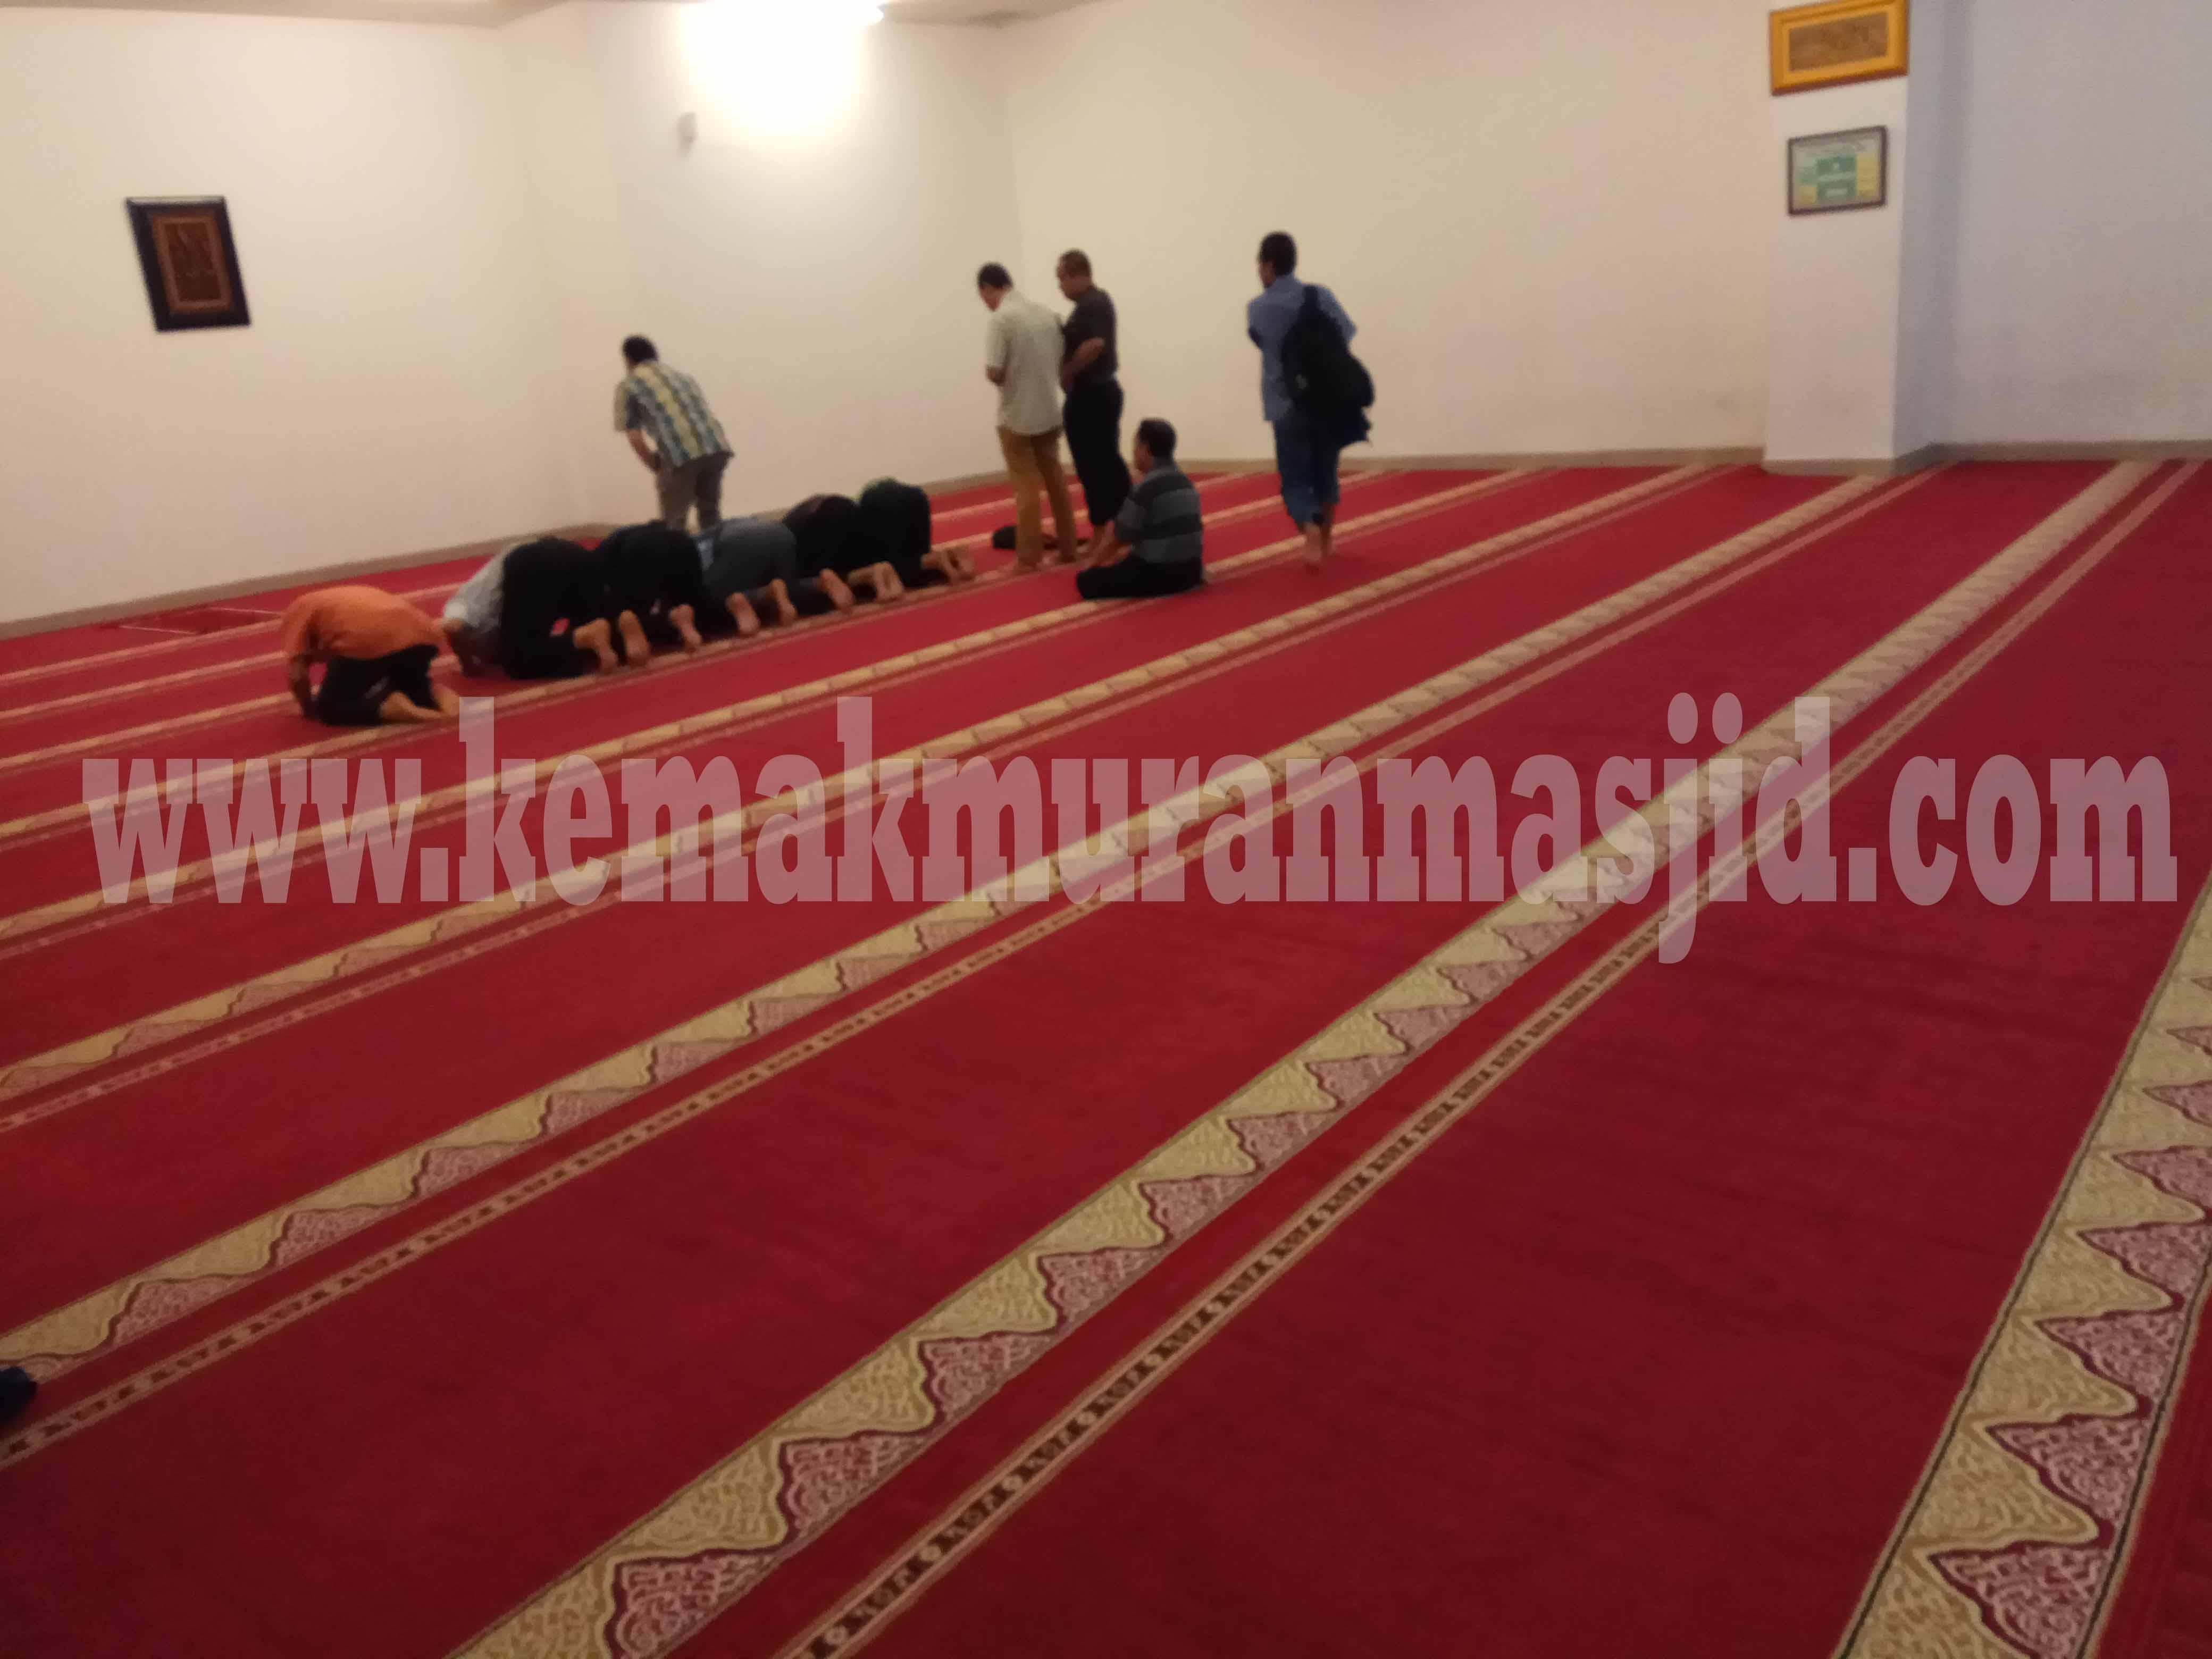 Al-Masjid an-Nabawi - Mosque In Medina Saudi Arabia